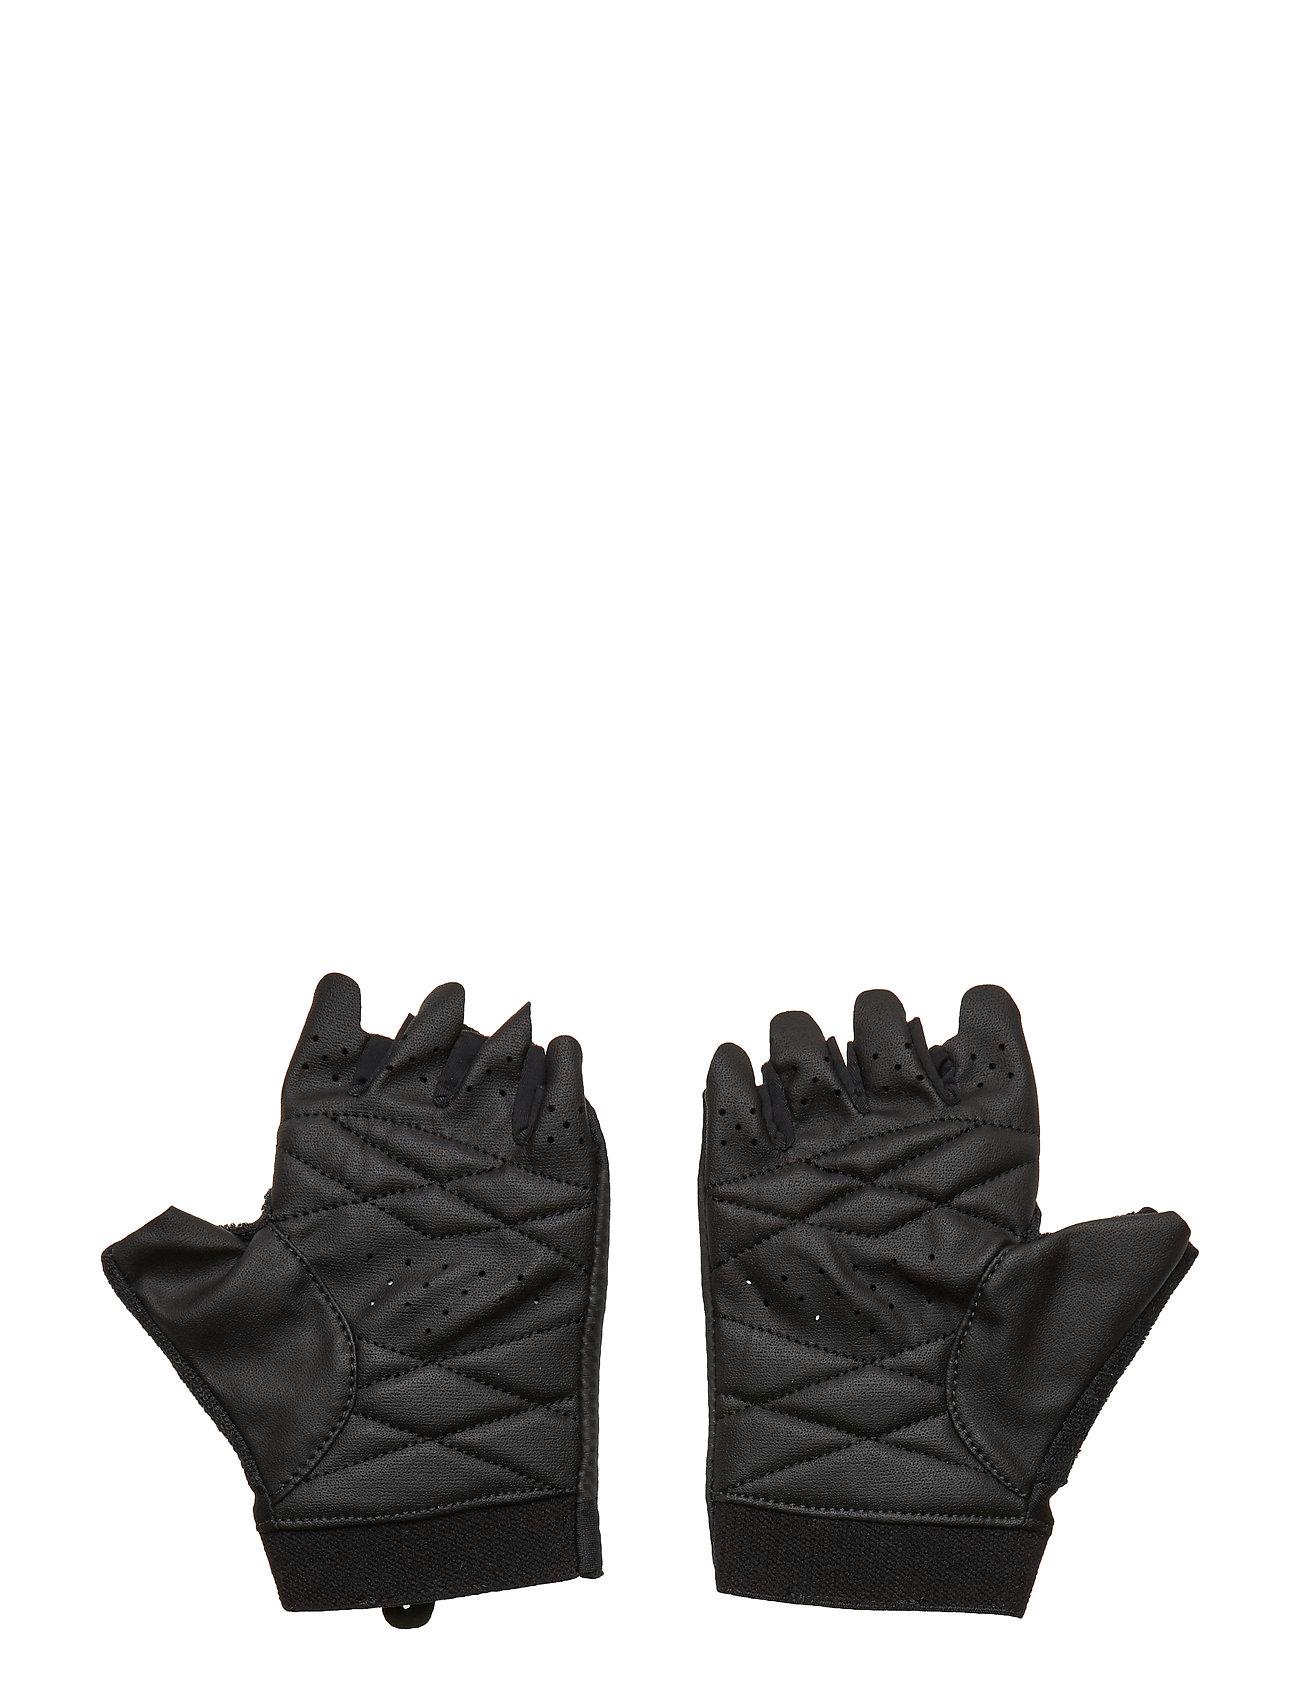 Under Armour - Women's Training Glove - accessoires - black - 1